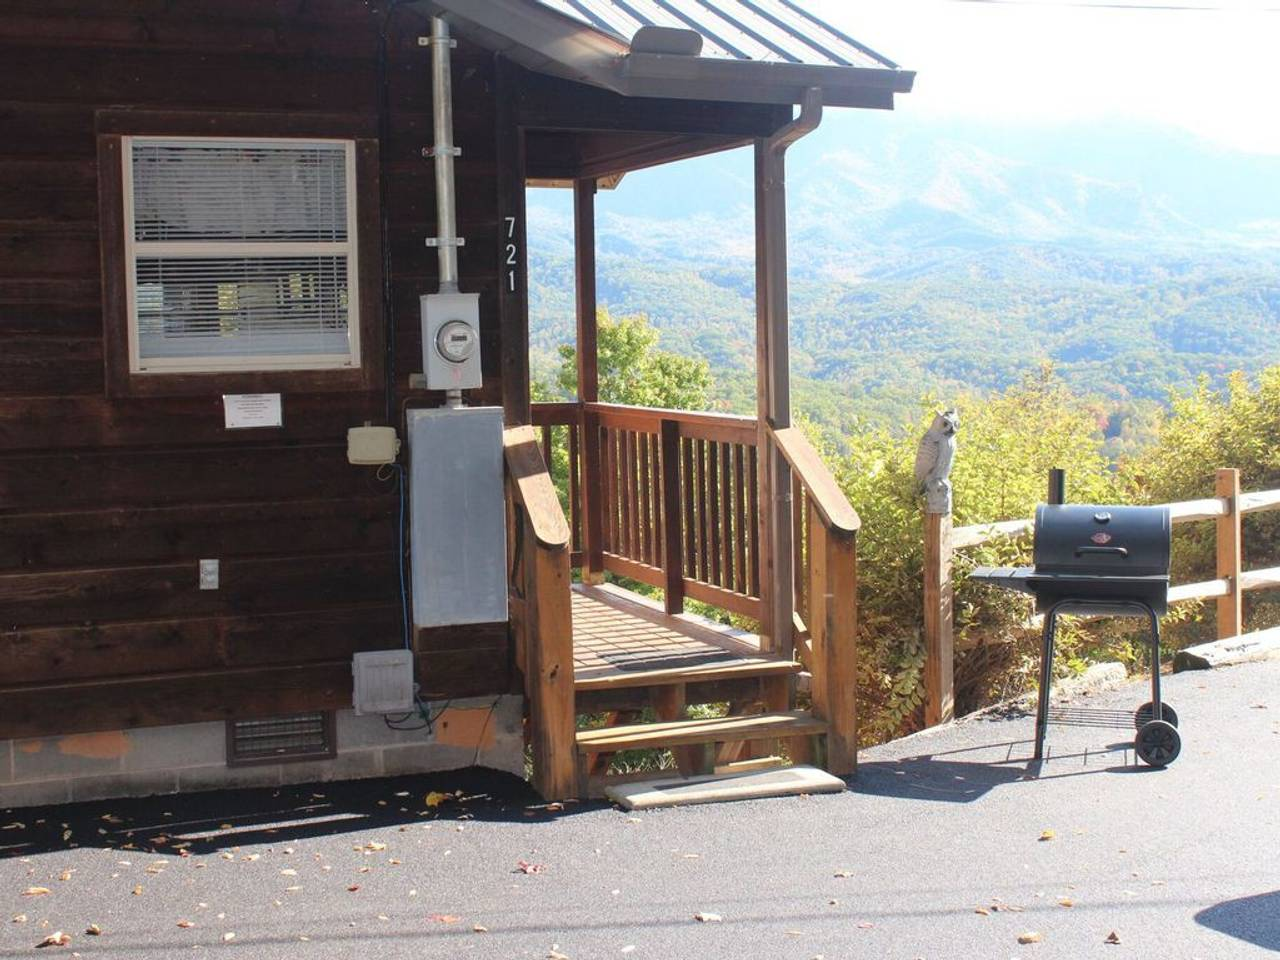 Apartment Huge Views Of GSMNP 3 6 Miles 2 DwTn Gat Hot Tub photo 18644586